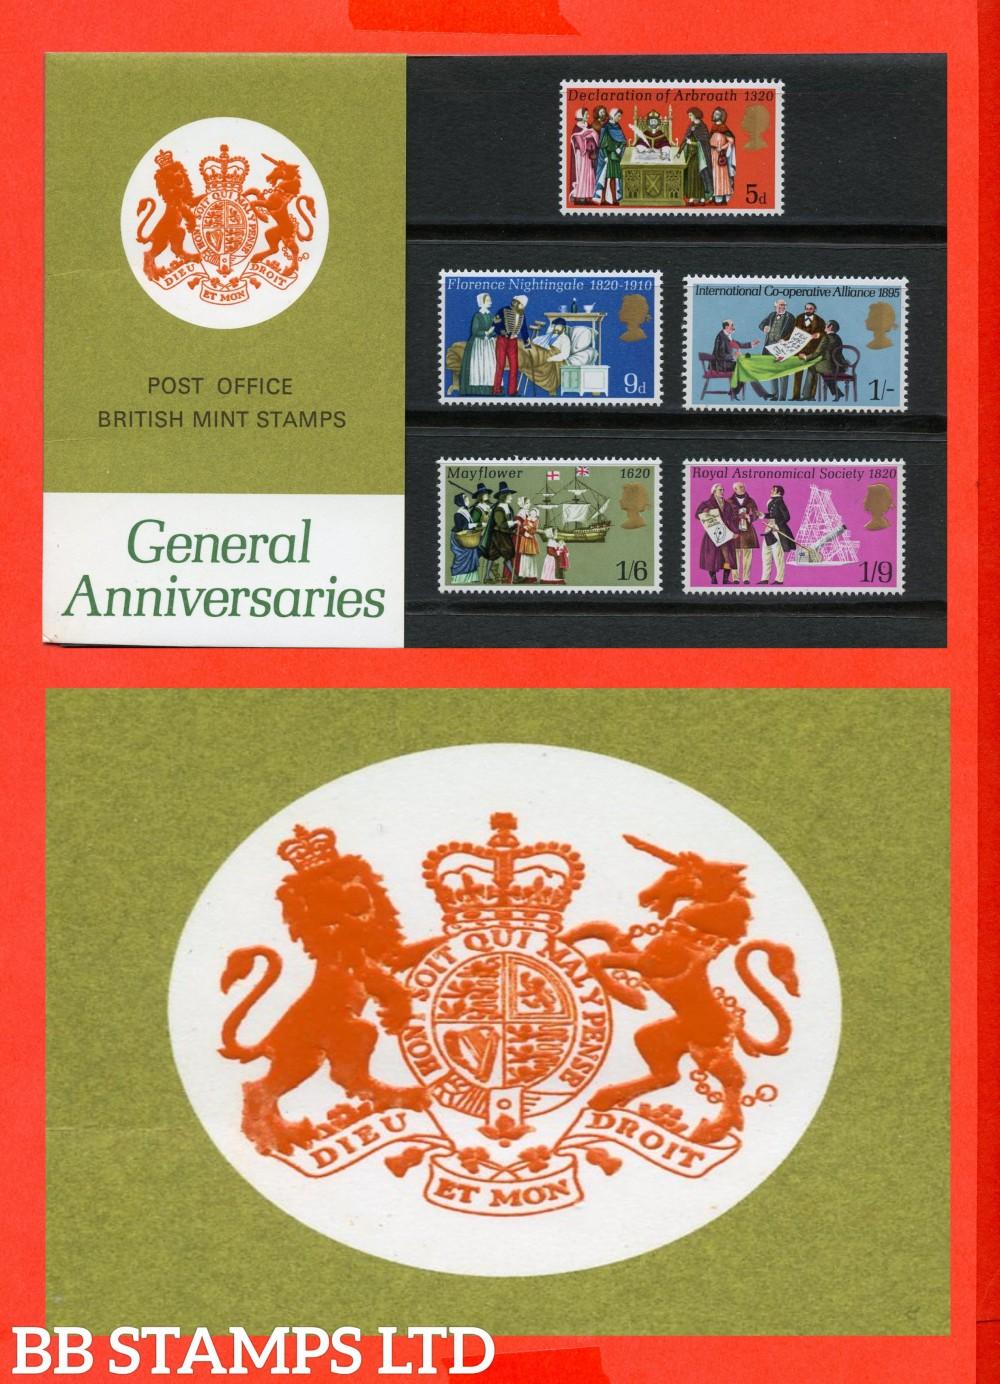 1970 General Anniversaries Pres Pack. Type I = Chain Visible, Marjorie Spelt Incorrect, Descendants Spelt Incorrect.